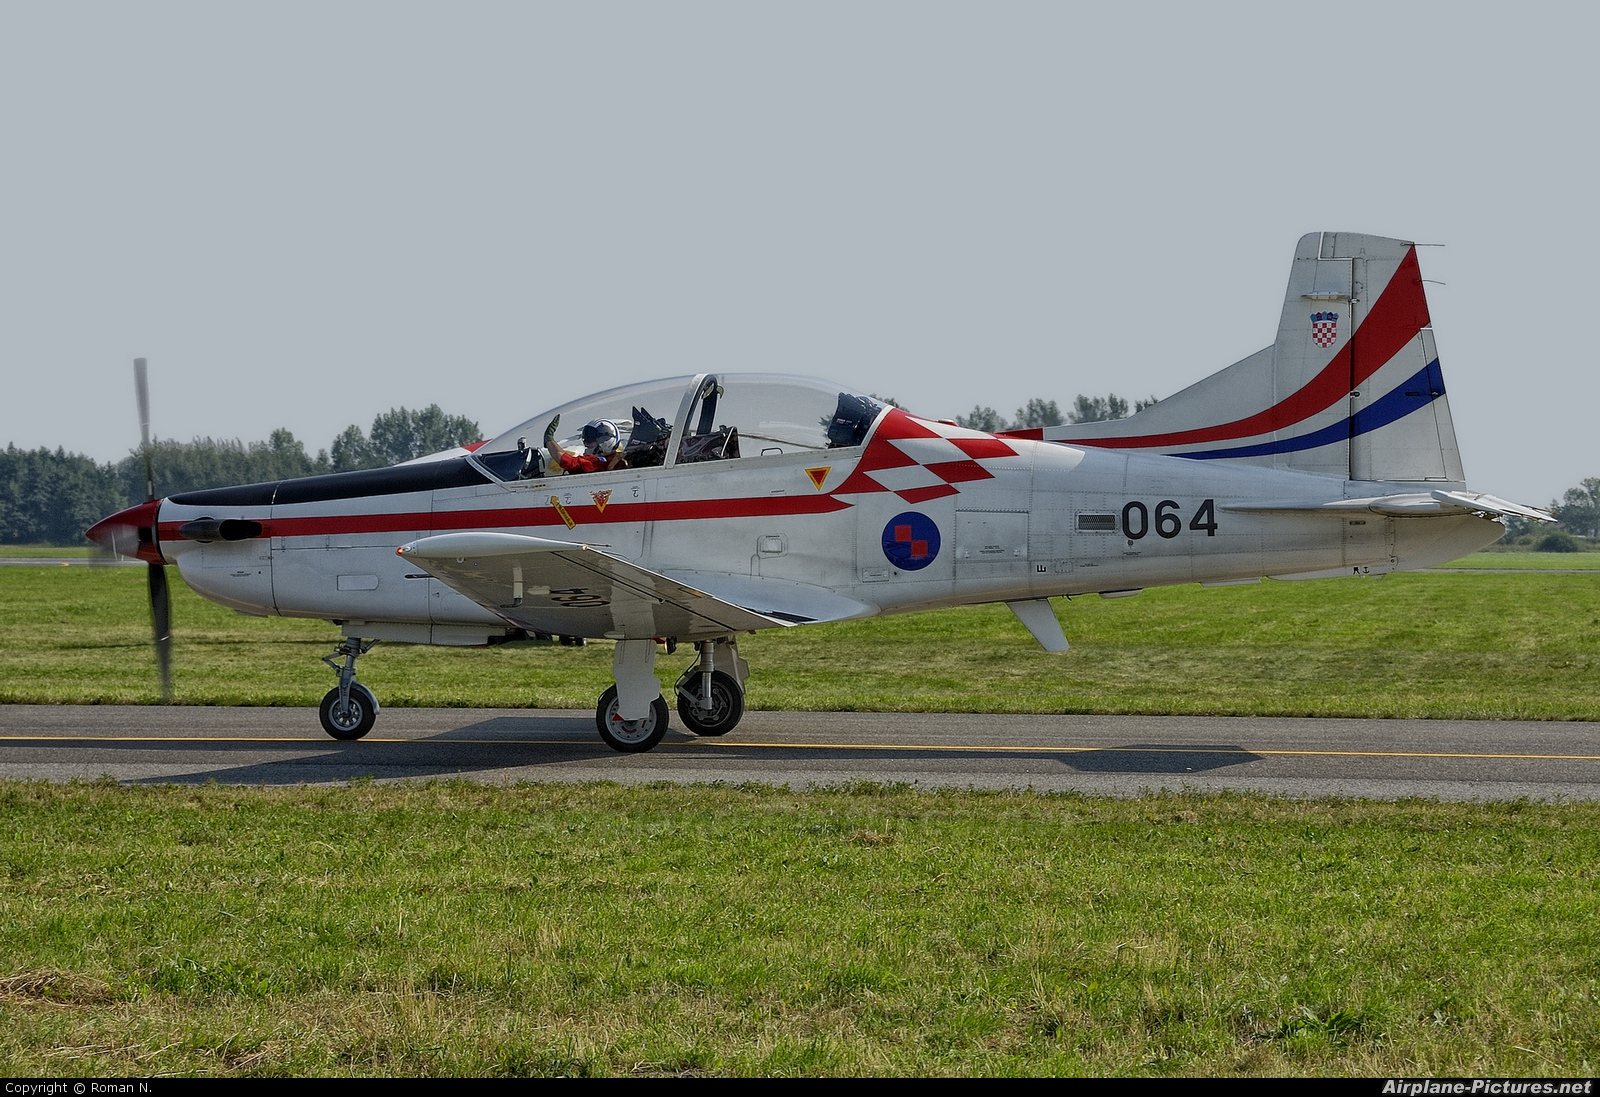 Croatia - Air Force 064 aircraft at Radom - Sadków